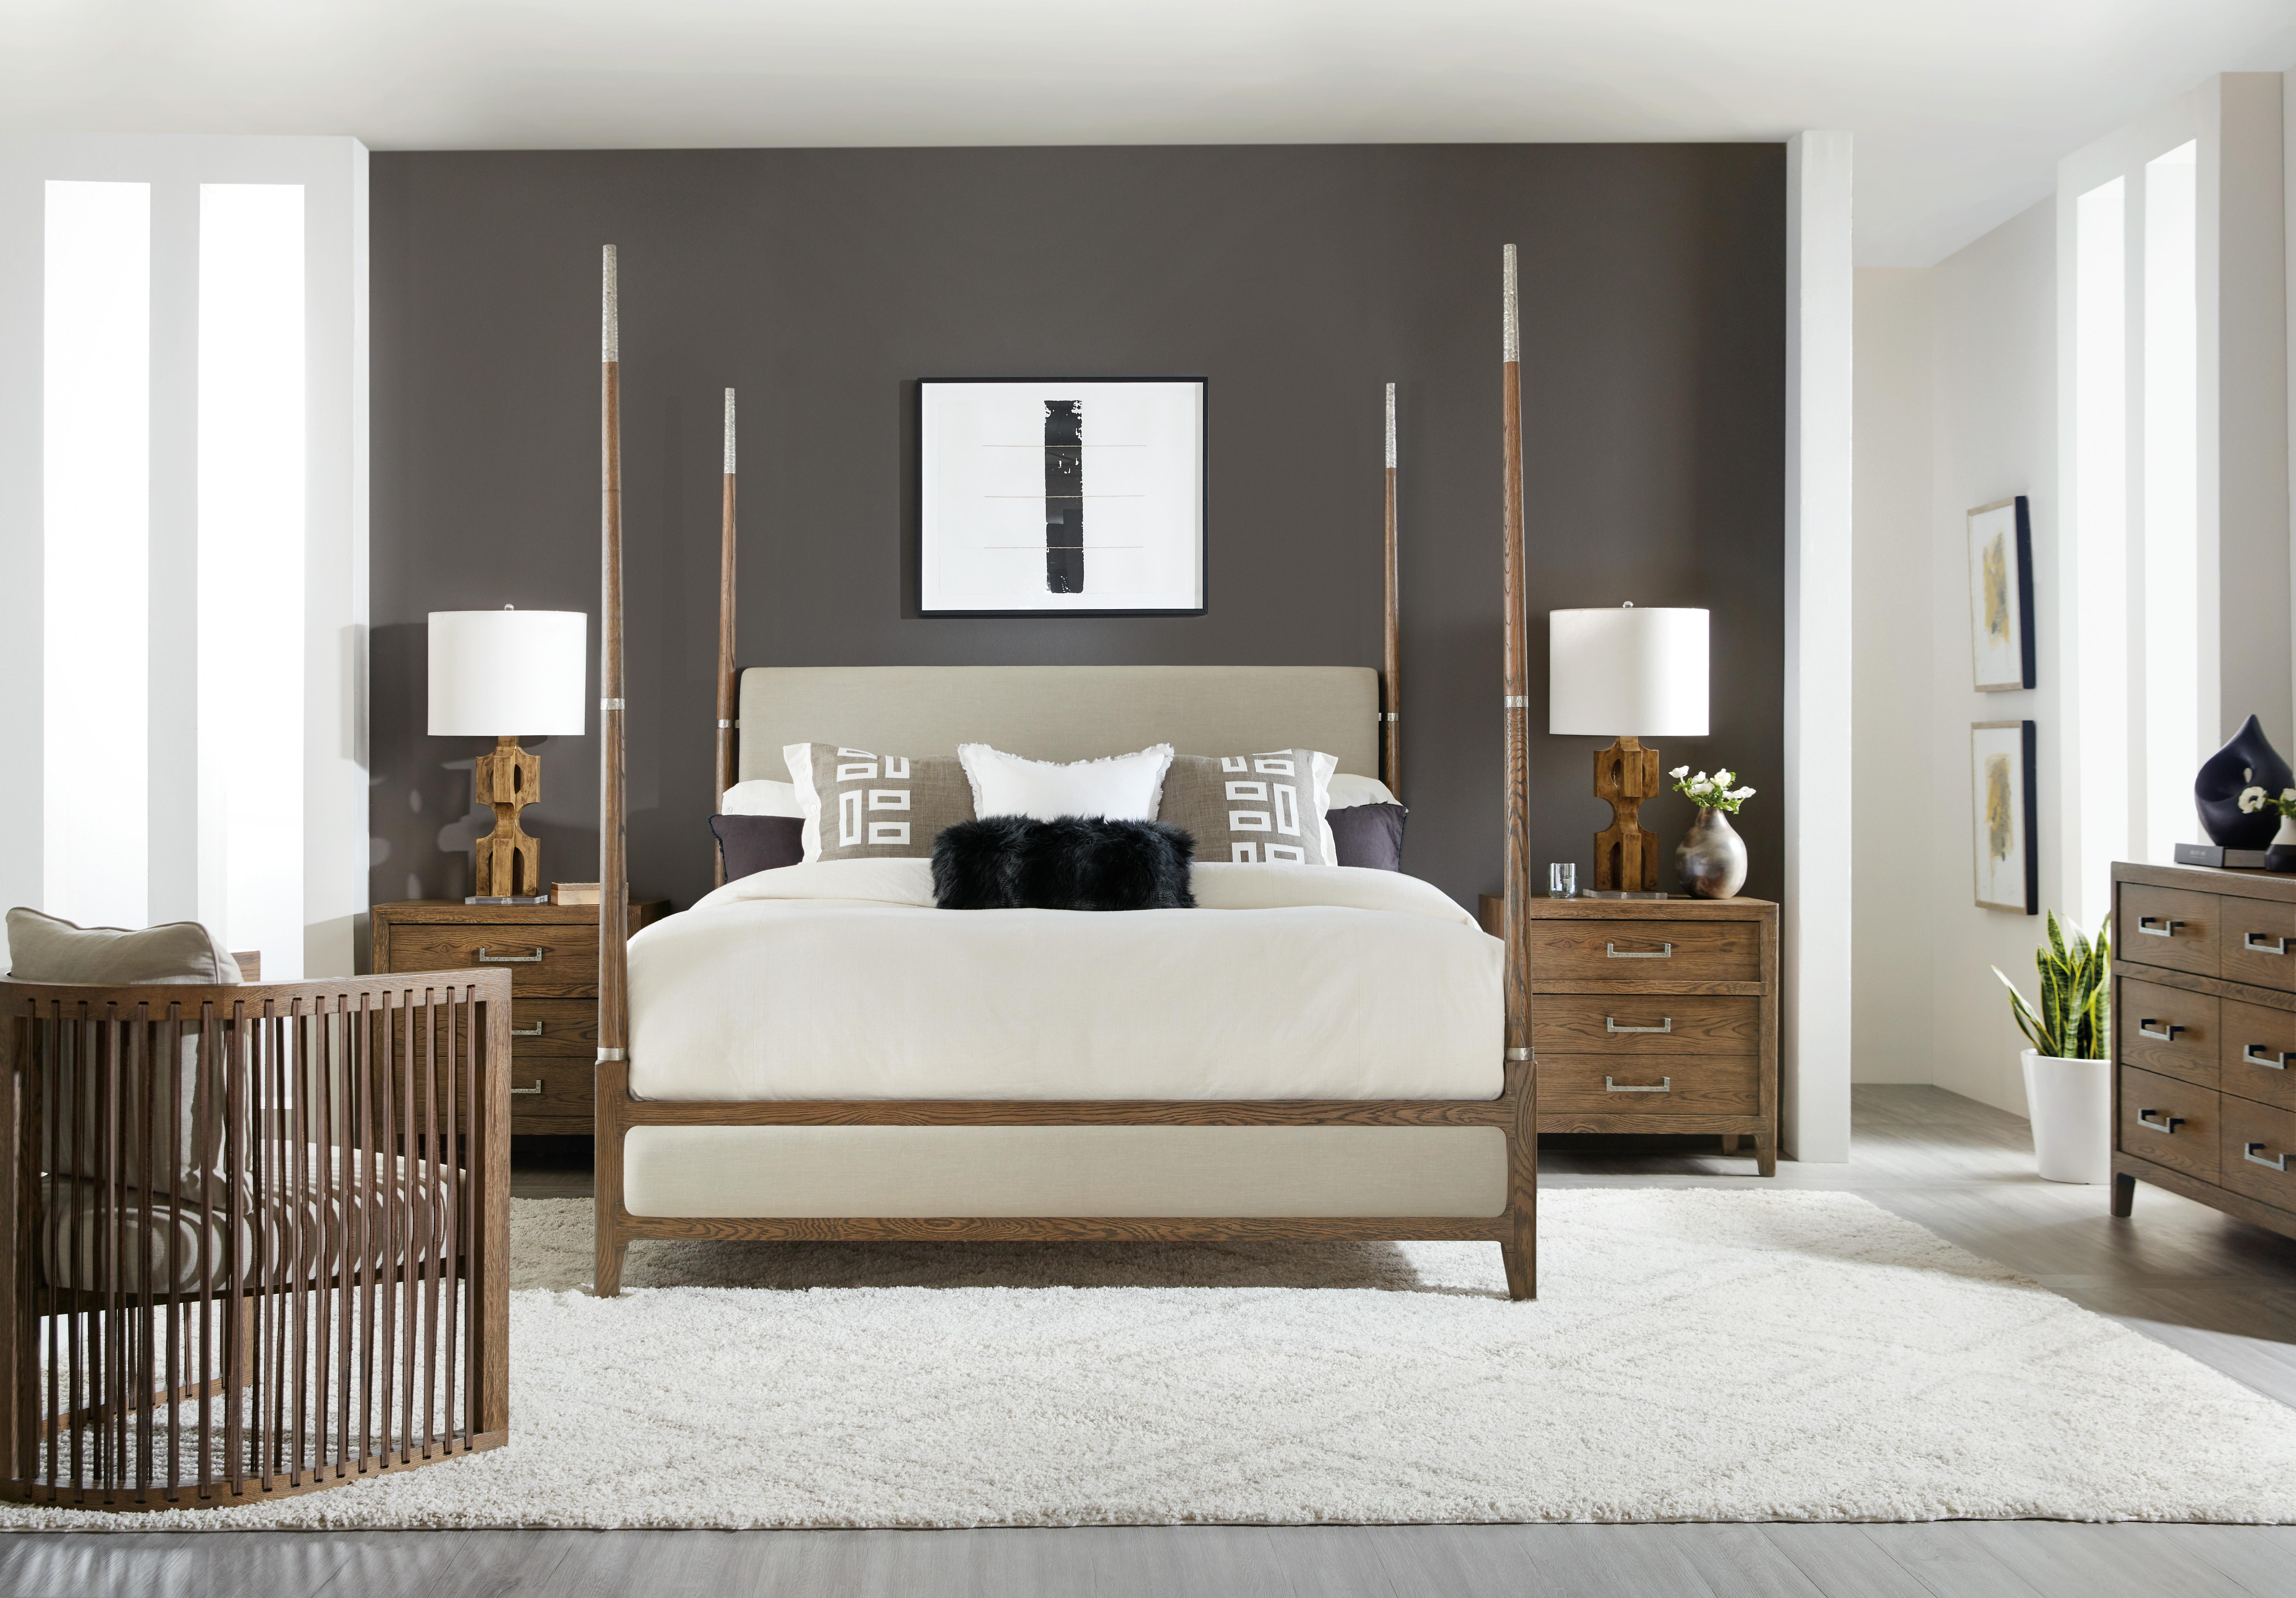 California King 4-Piece Bedroom Set